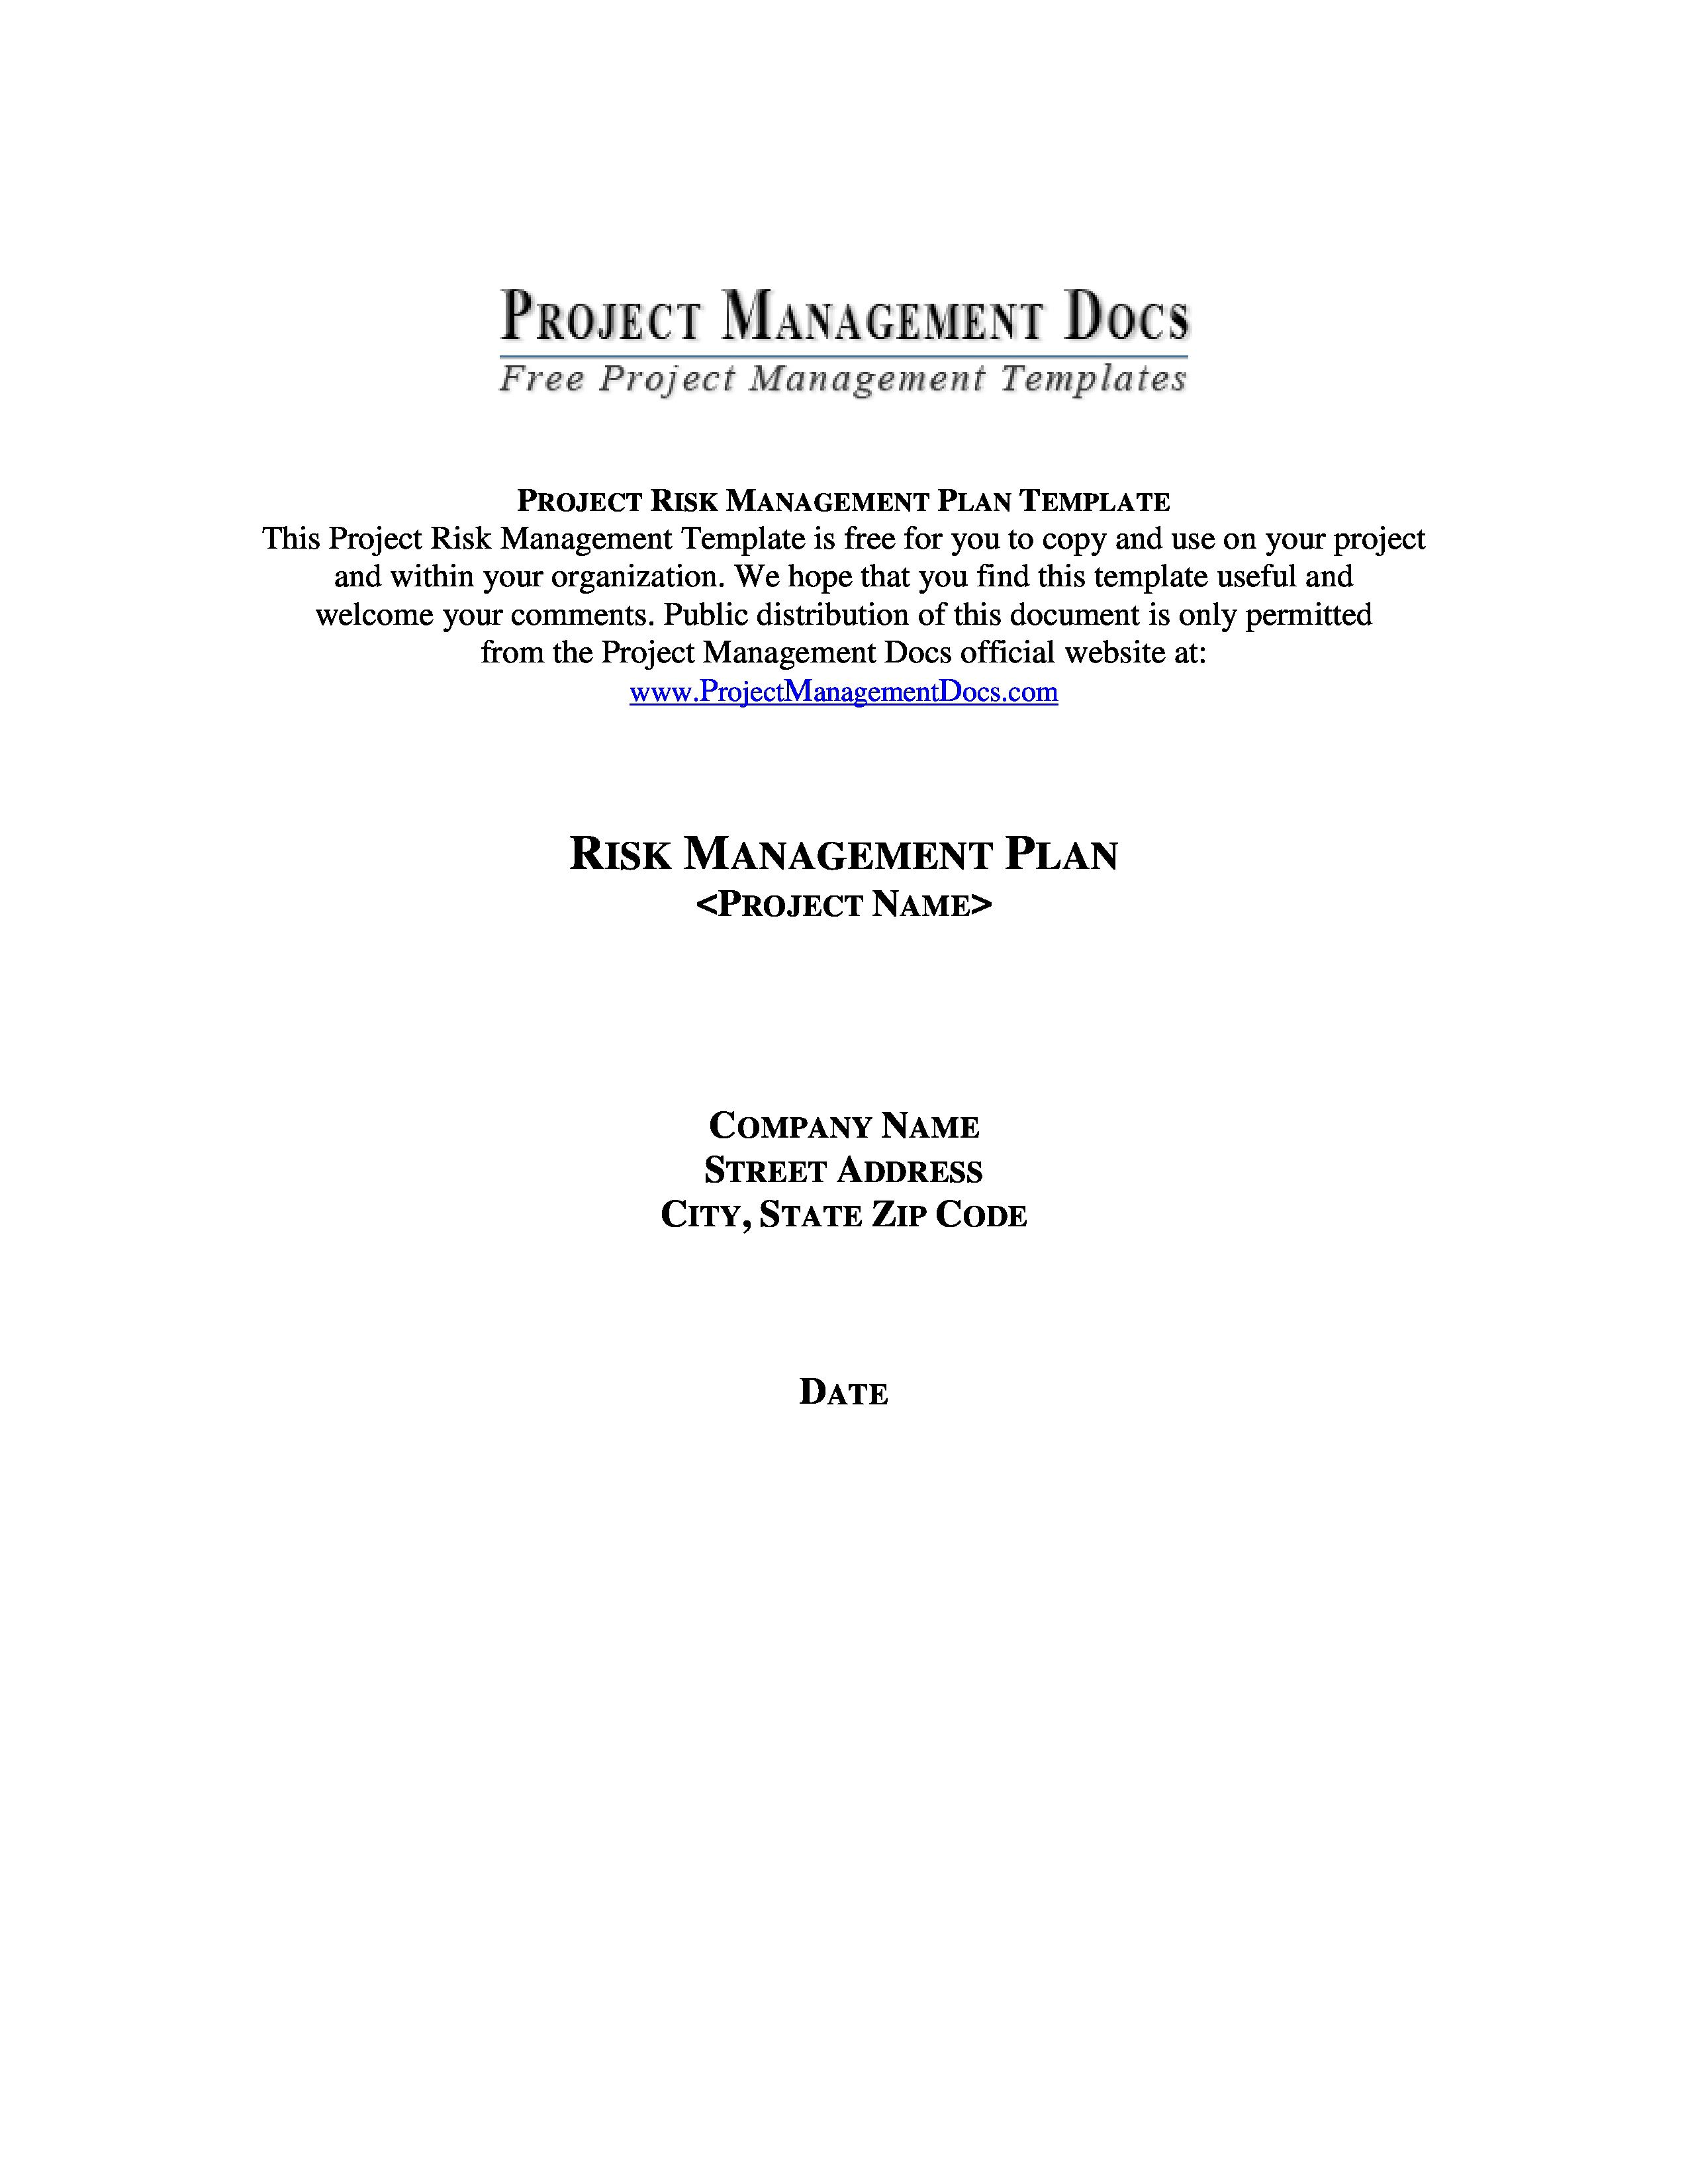 Risk Management Plan Template Pmbok Project Risk Management Plan